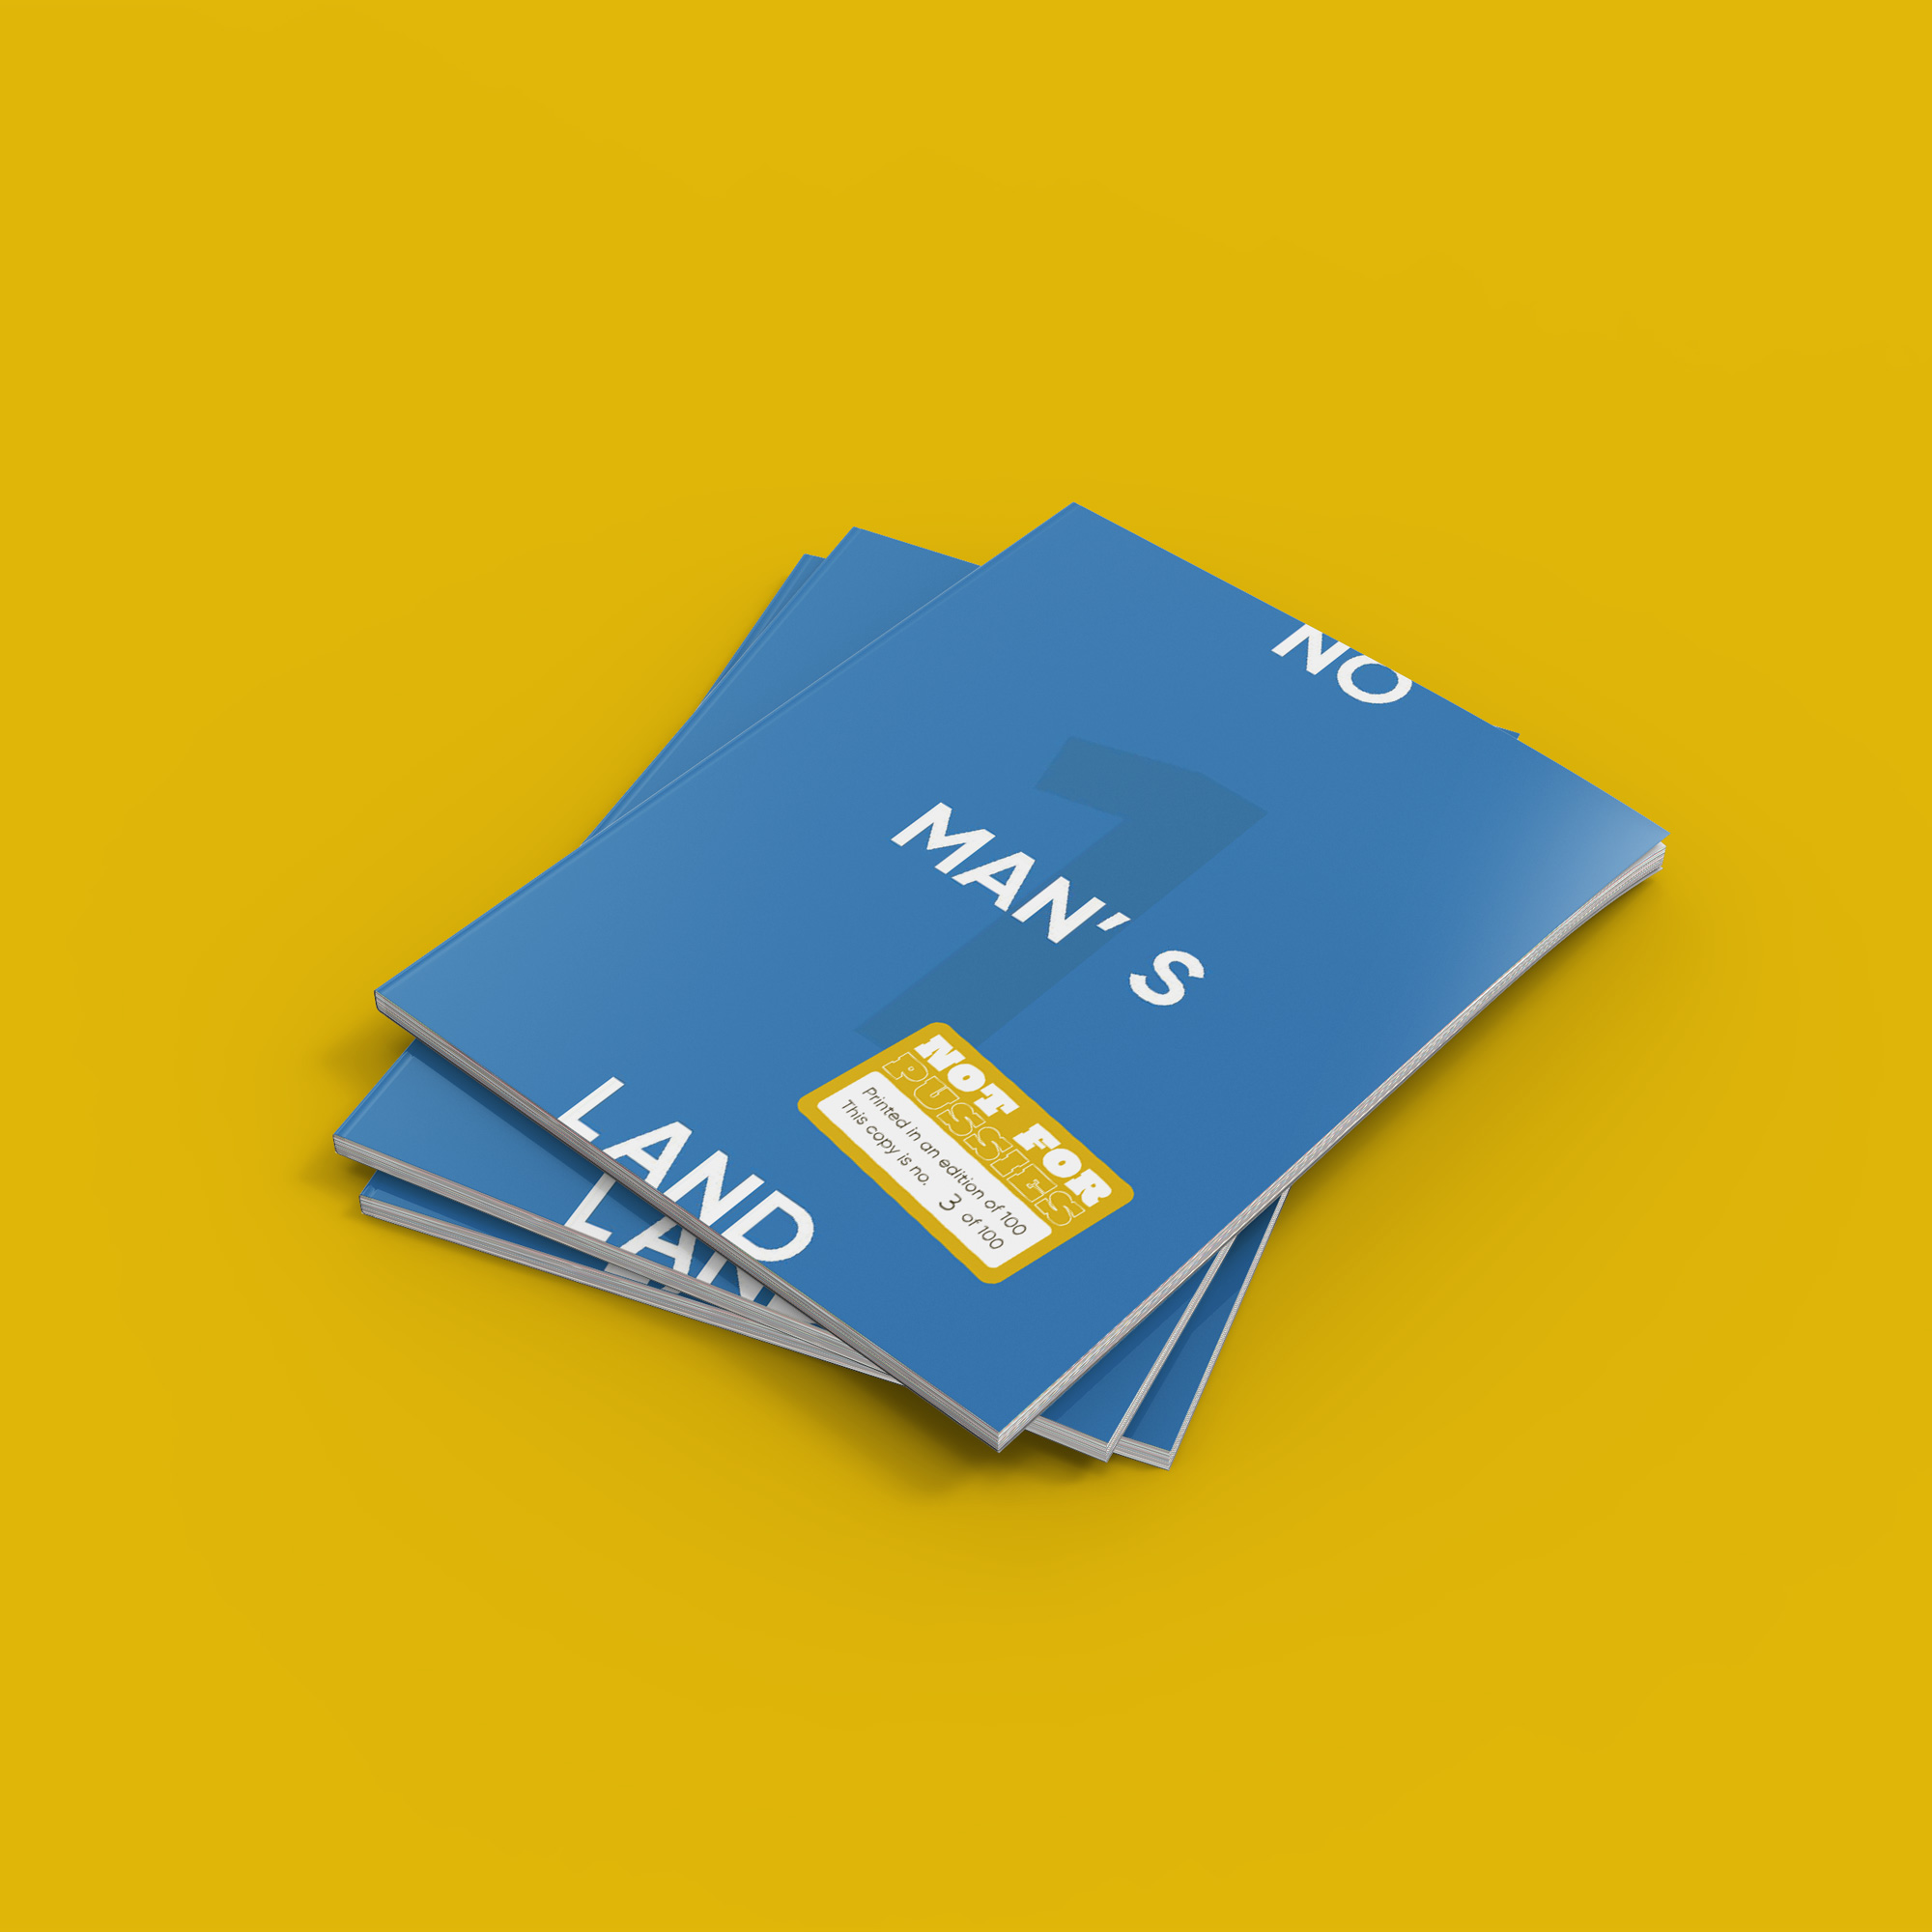 No Man's Land Magazine (Cover)